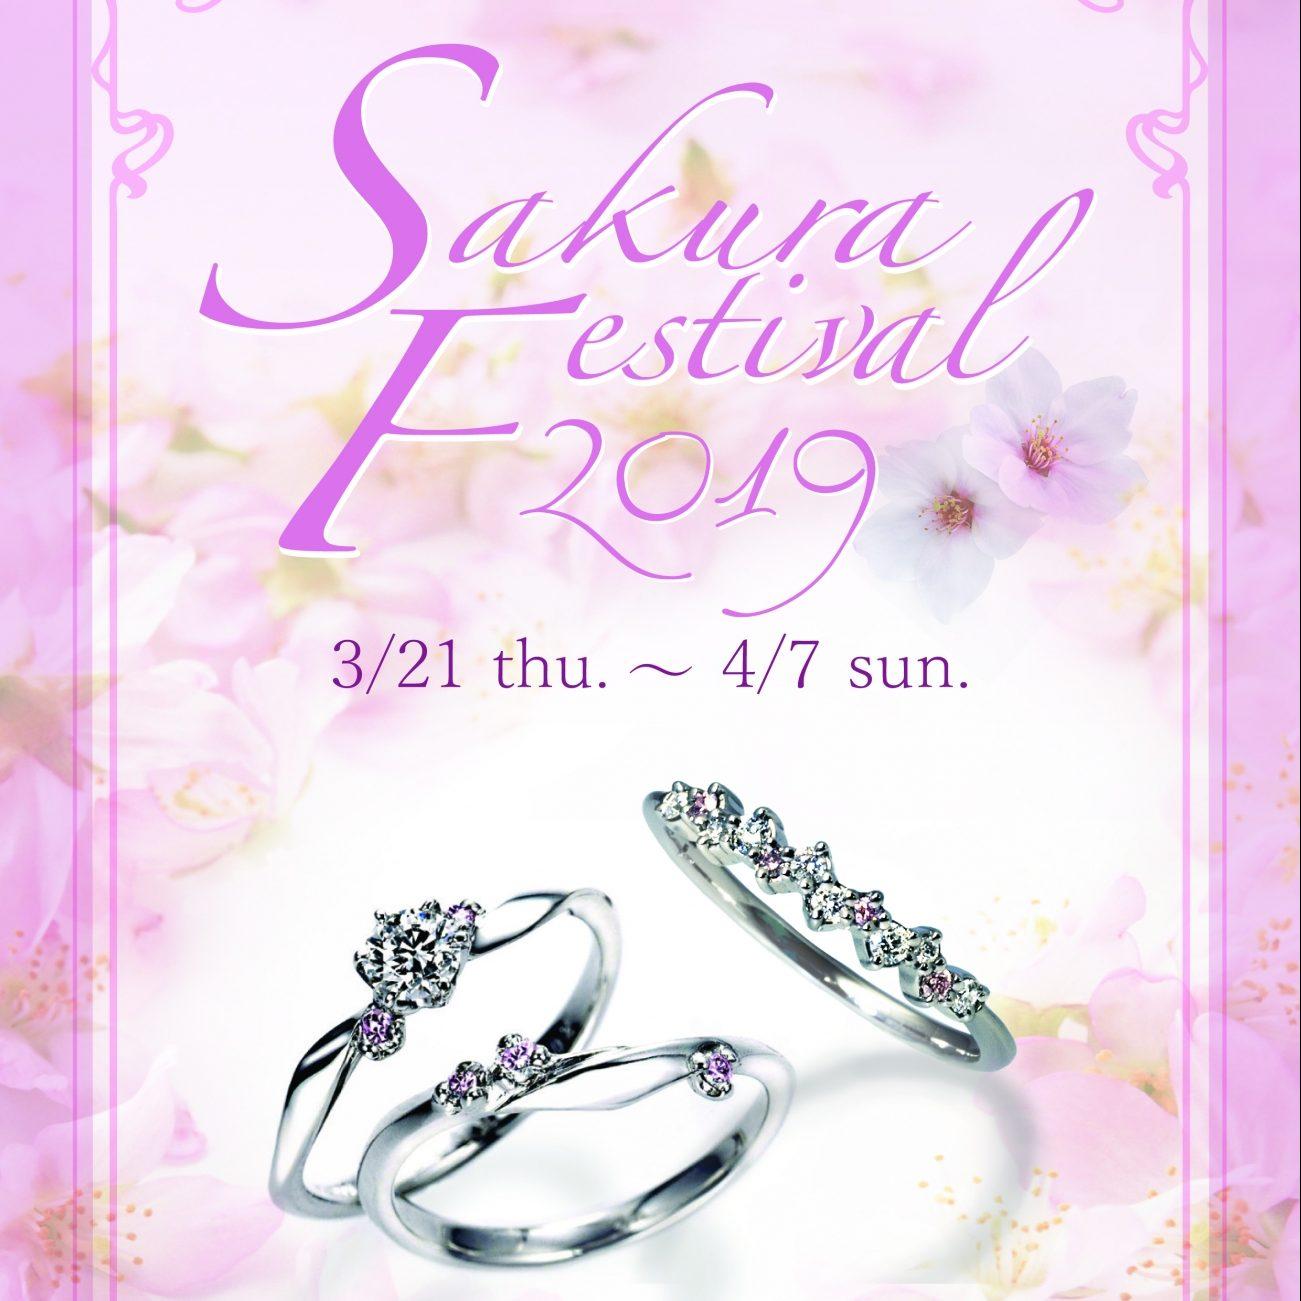 LAPAGE SAKURA FESTIVAL 2019